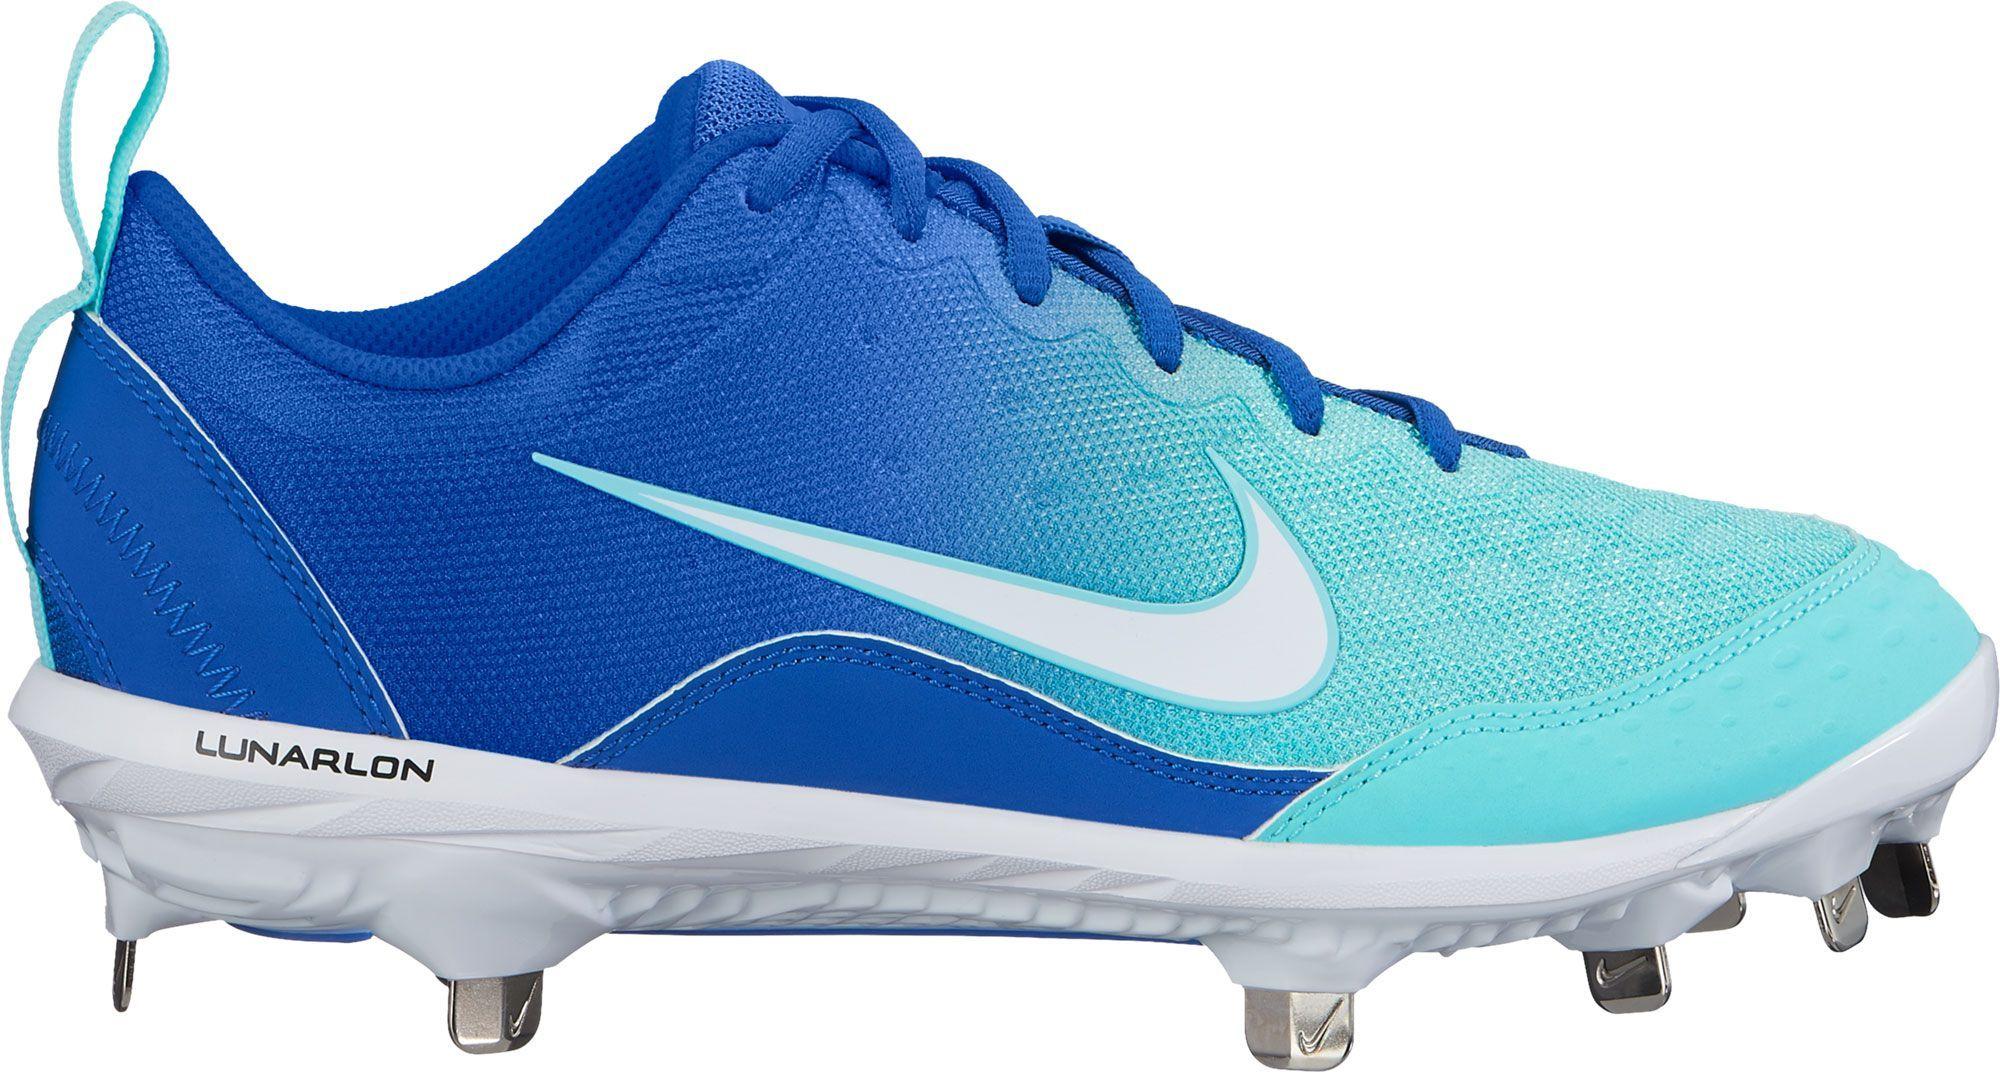 c406eef353b9f Nike Women's Lunar Hyperdiamond 2 Pro Fastpitch Softball Cleats ...